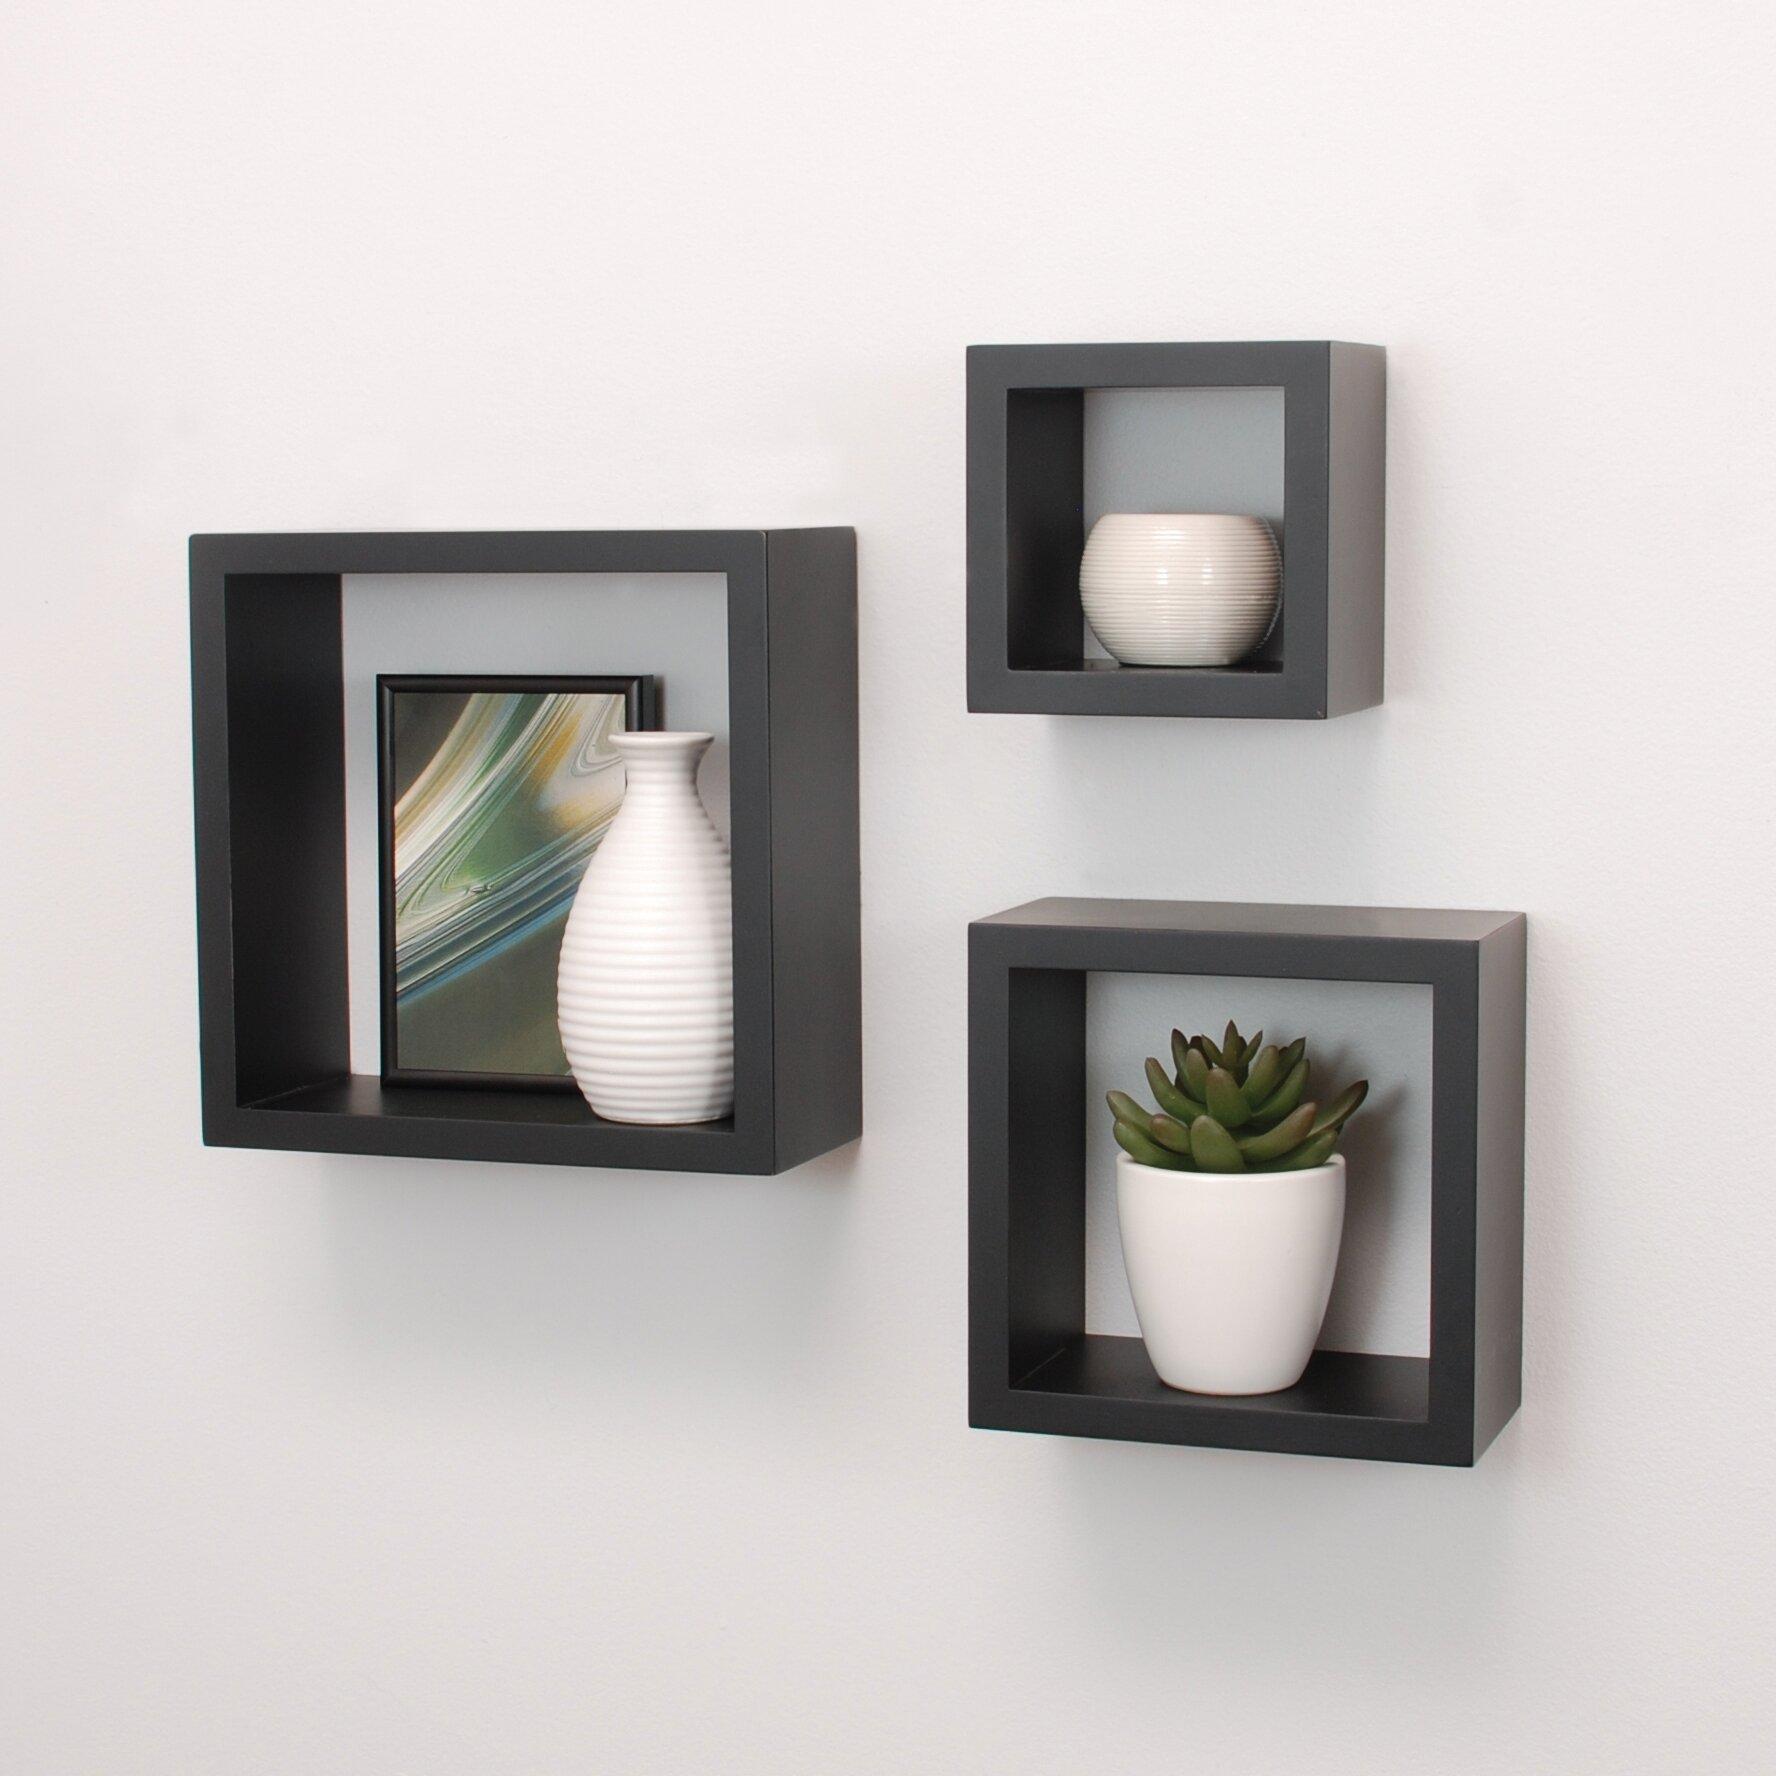 Nexxt design cubbi 3 piece wall shelf set reviews wayfair - Etageres cubes murales ...